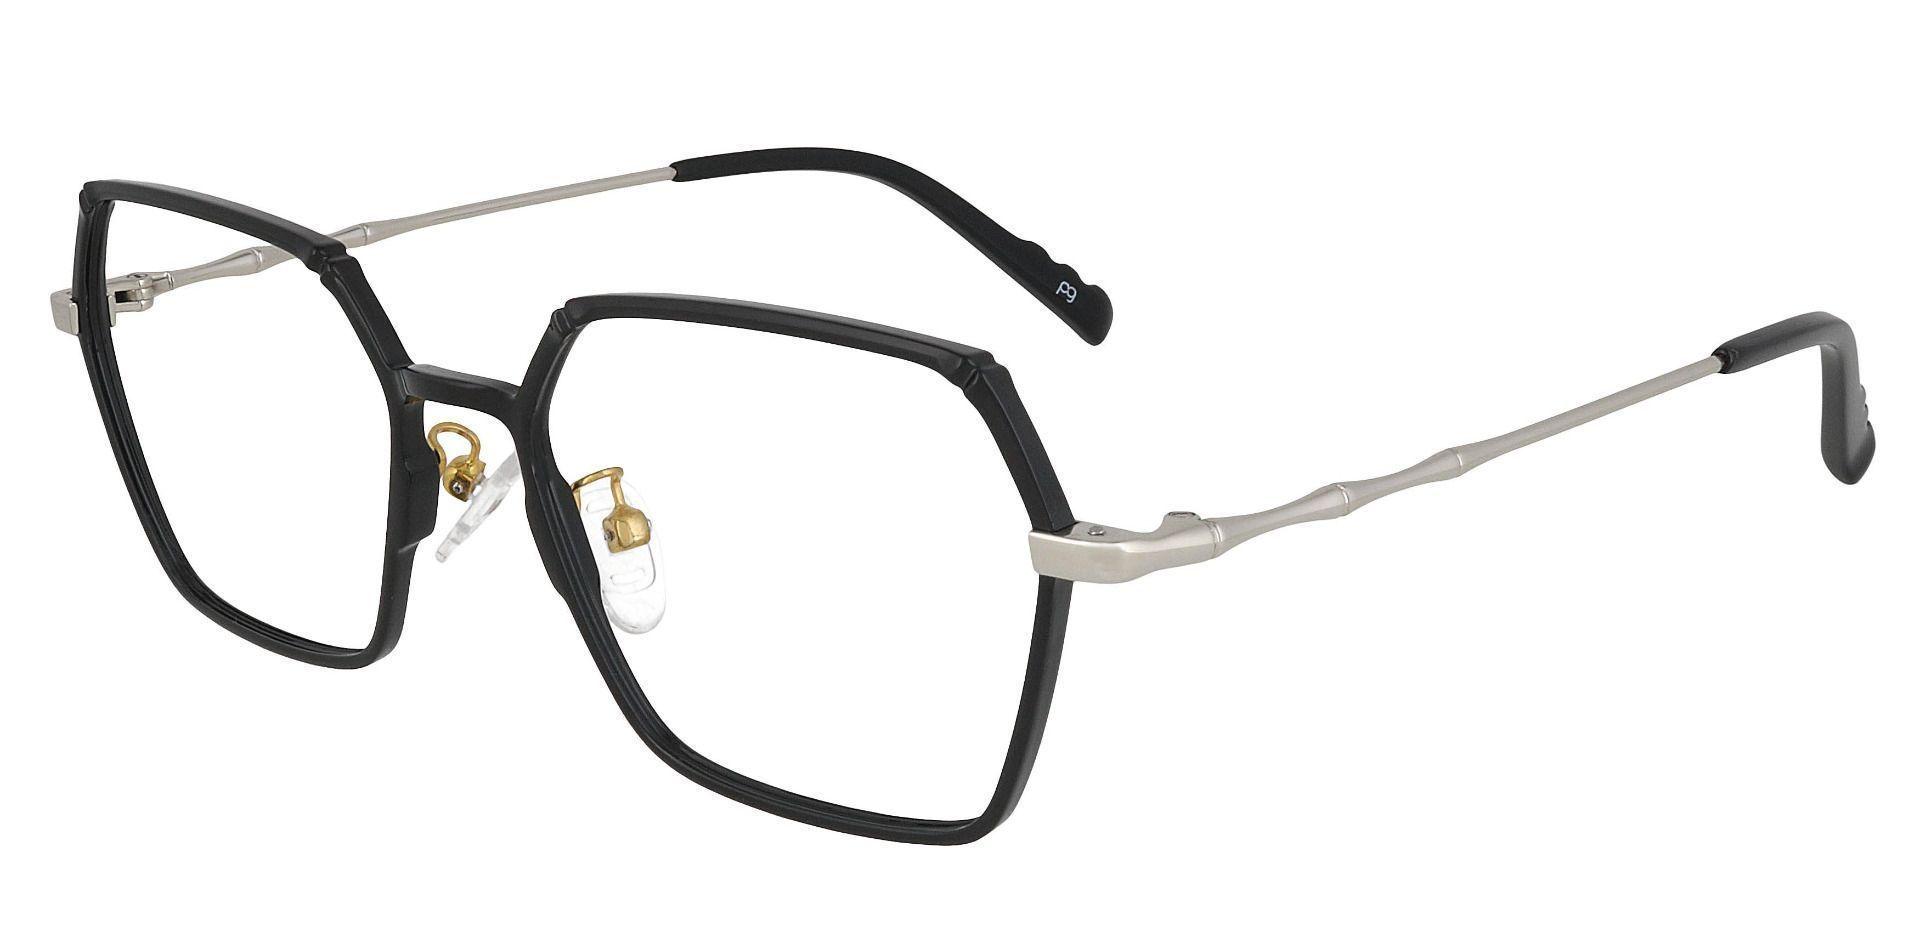 Daro Geometric Prescription Glasses - Black